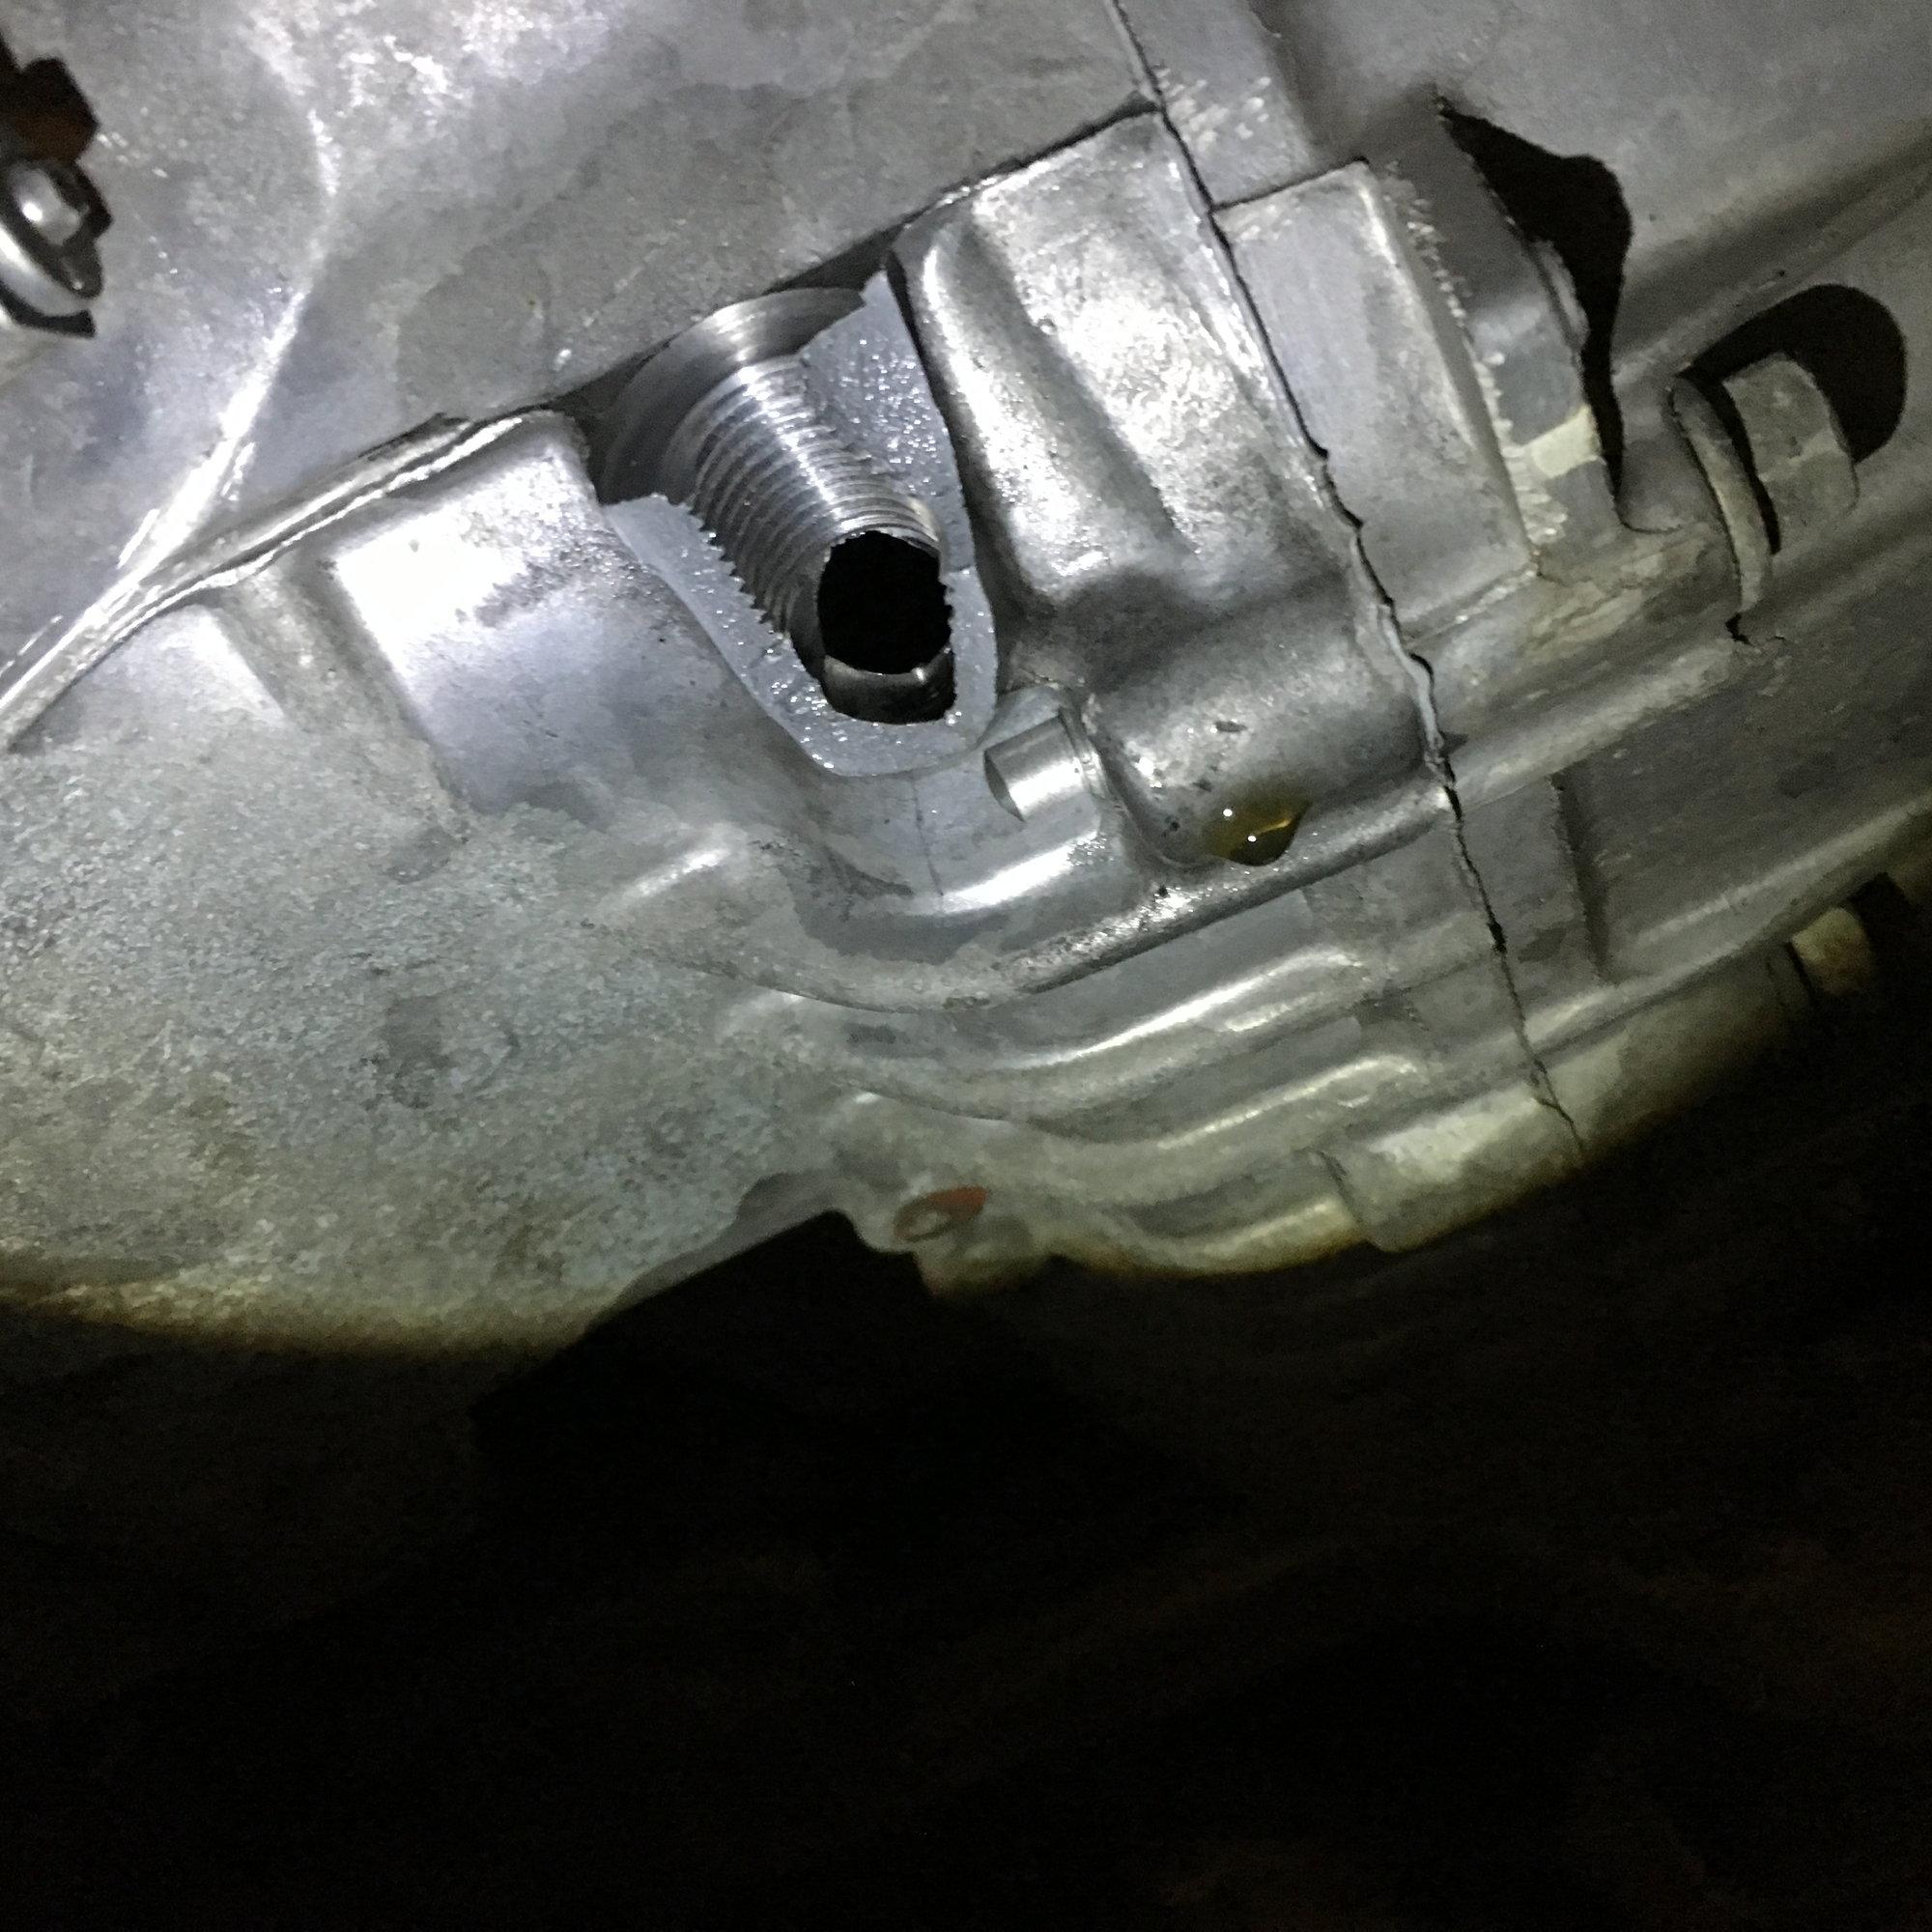 I Broke The Transmission Drain Hole